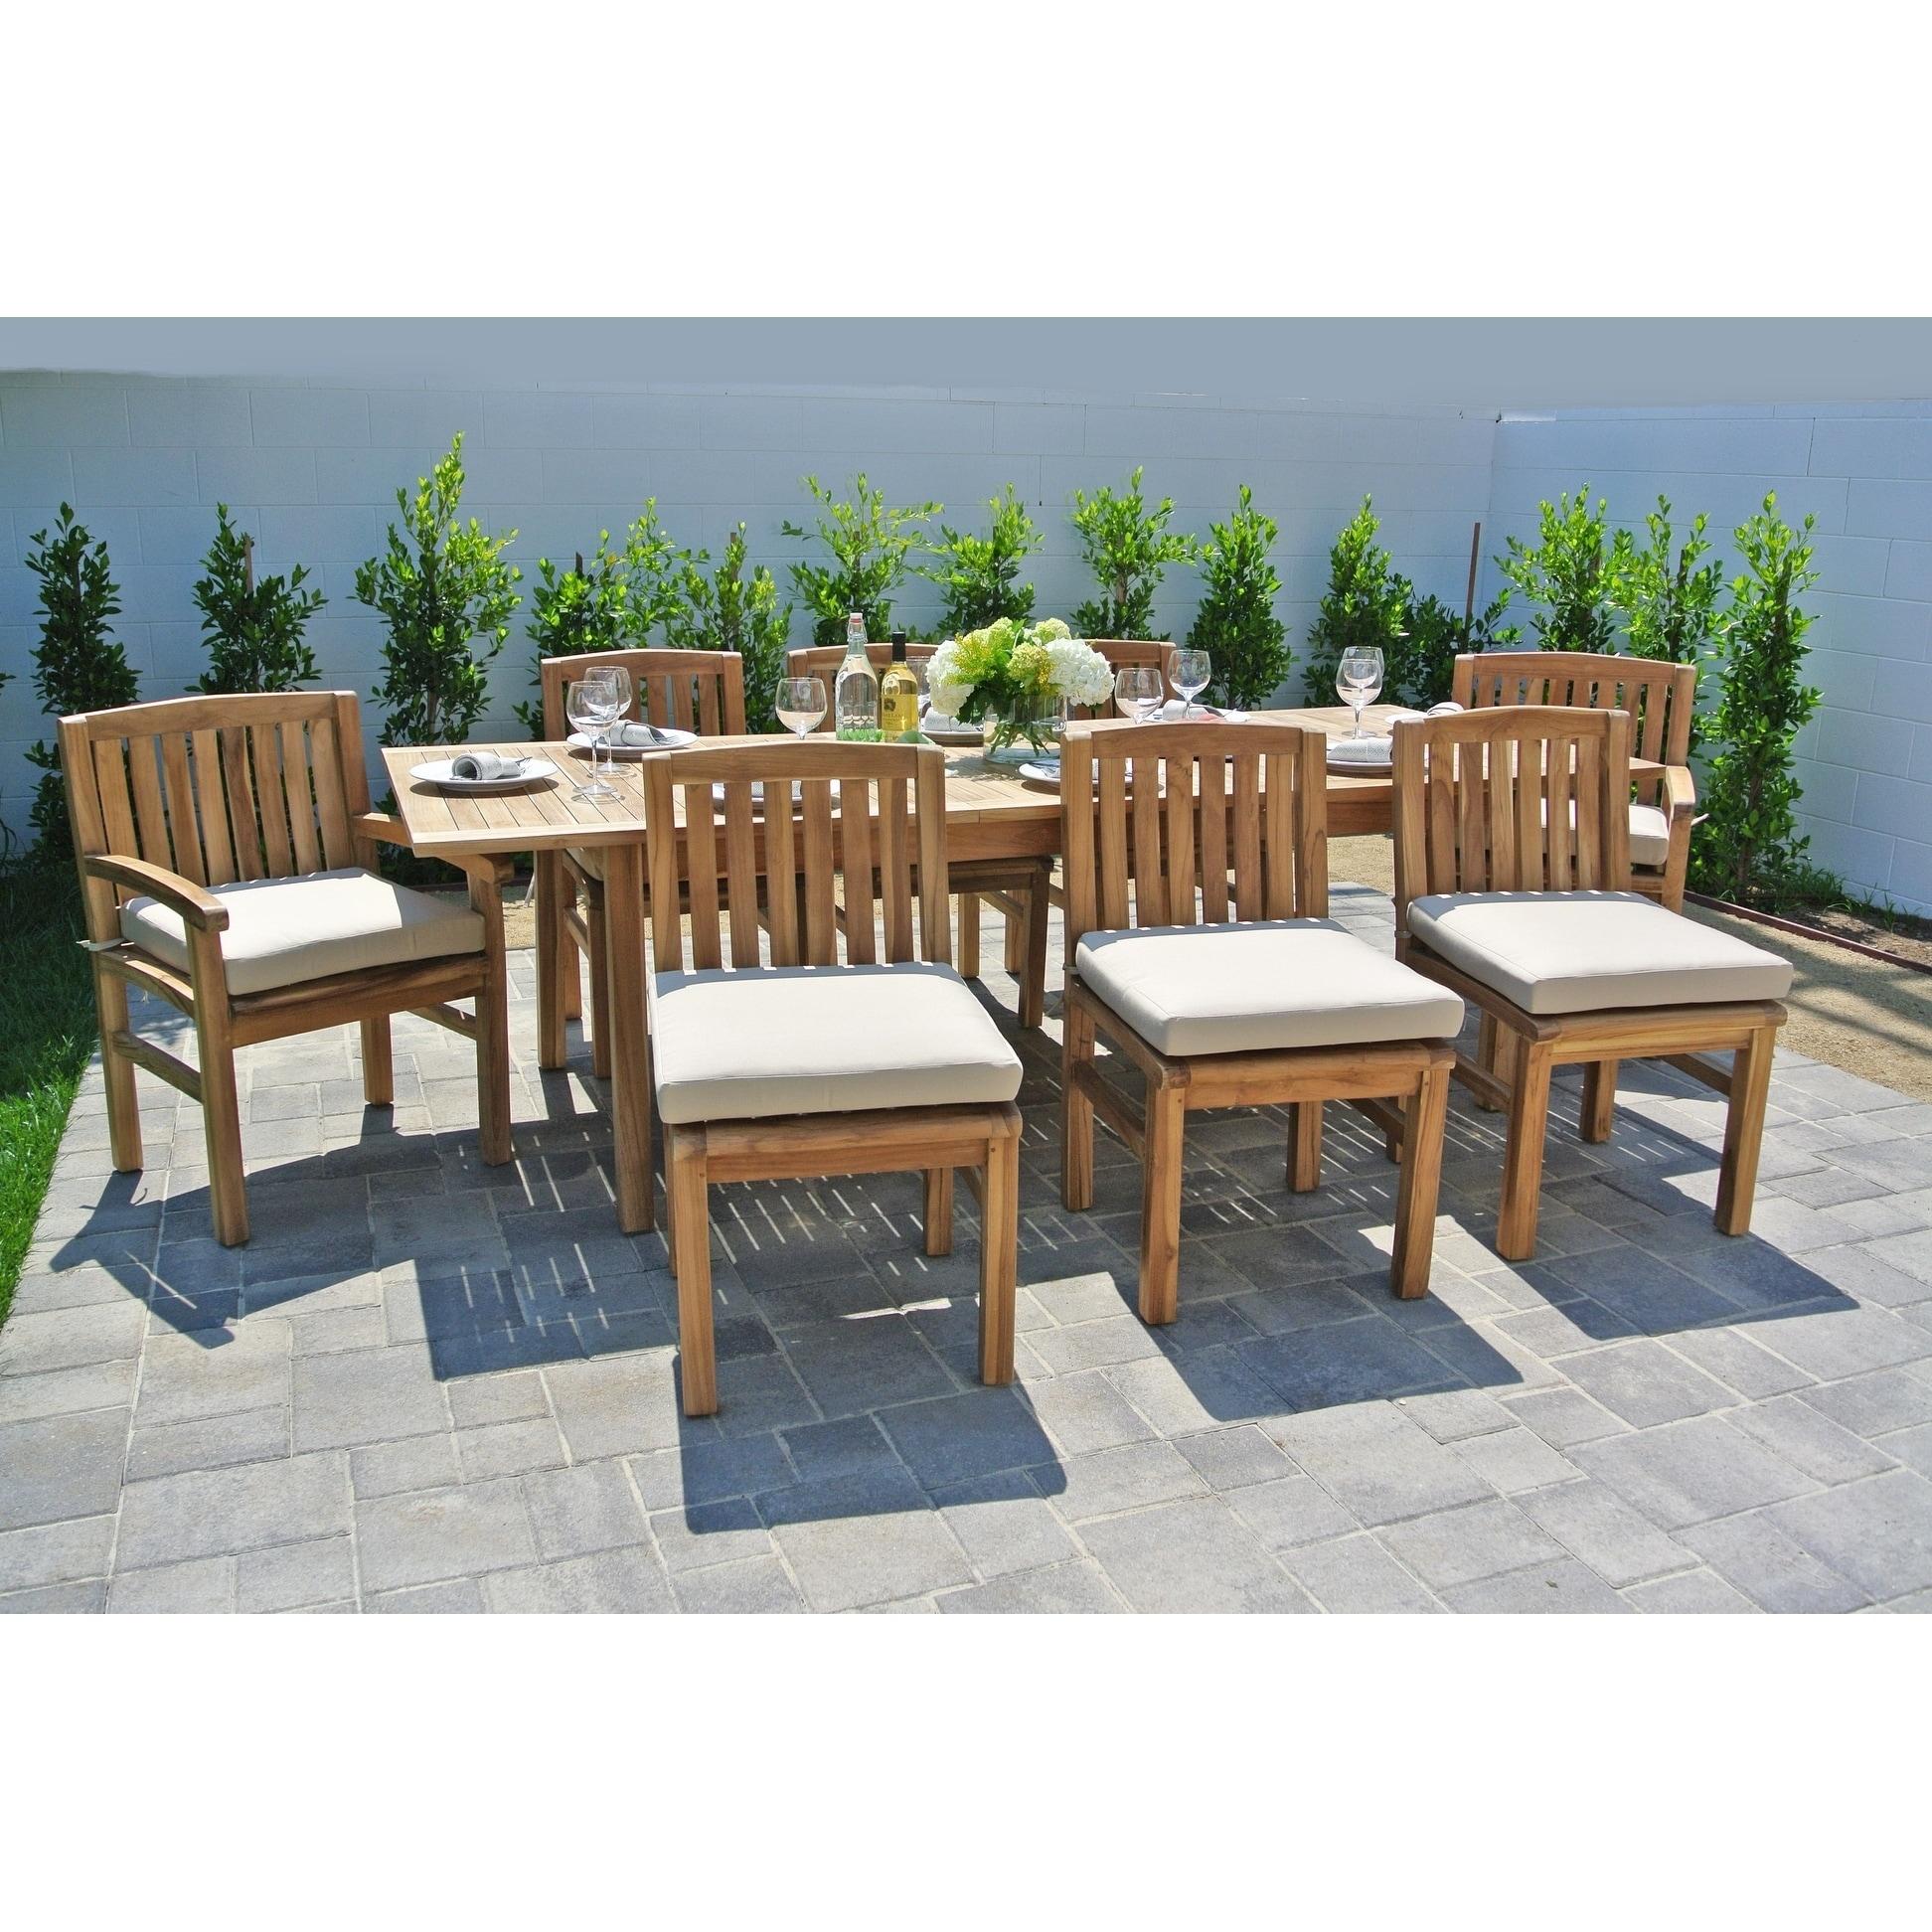 9 pc Huntington Teak Outdoor Patio Furniture Dining Set with ...